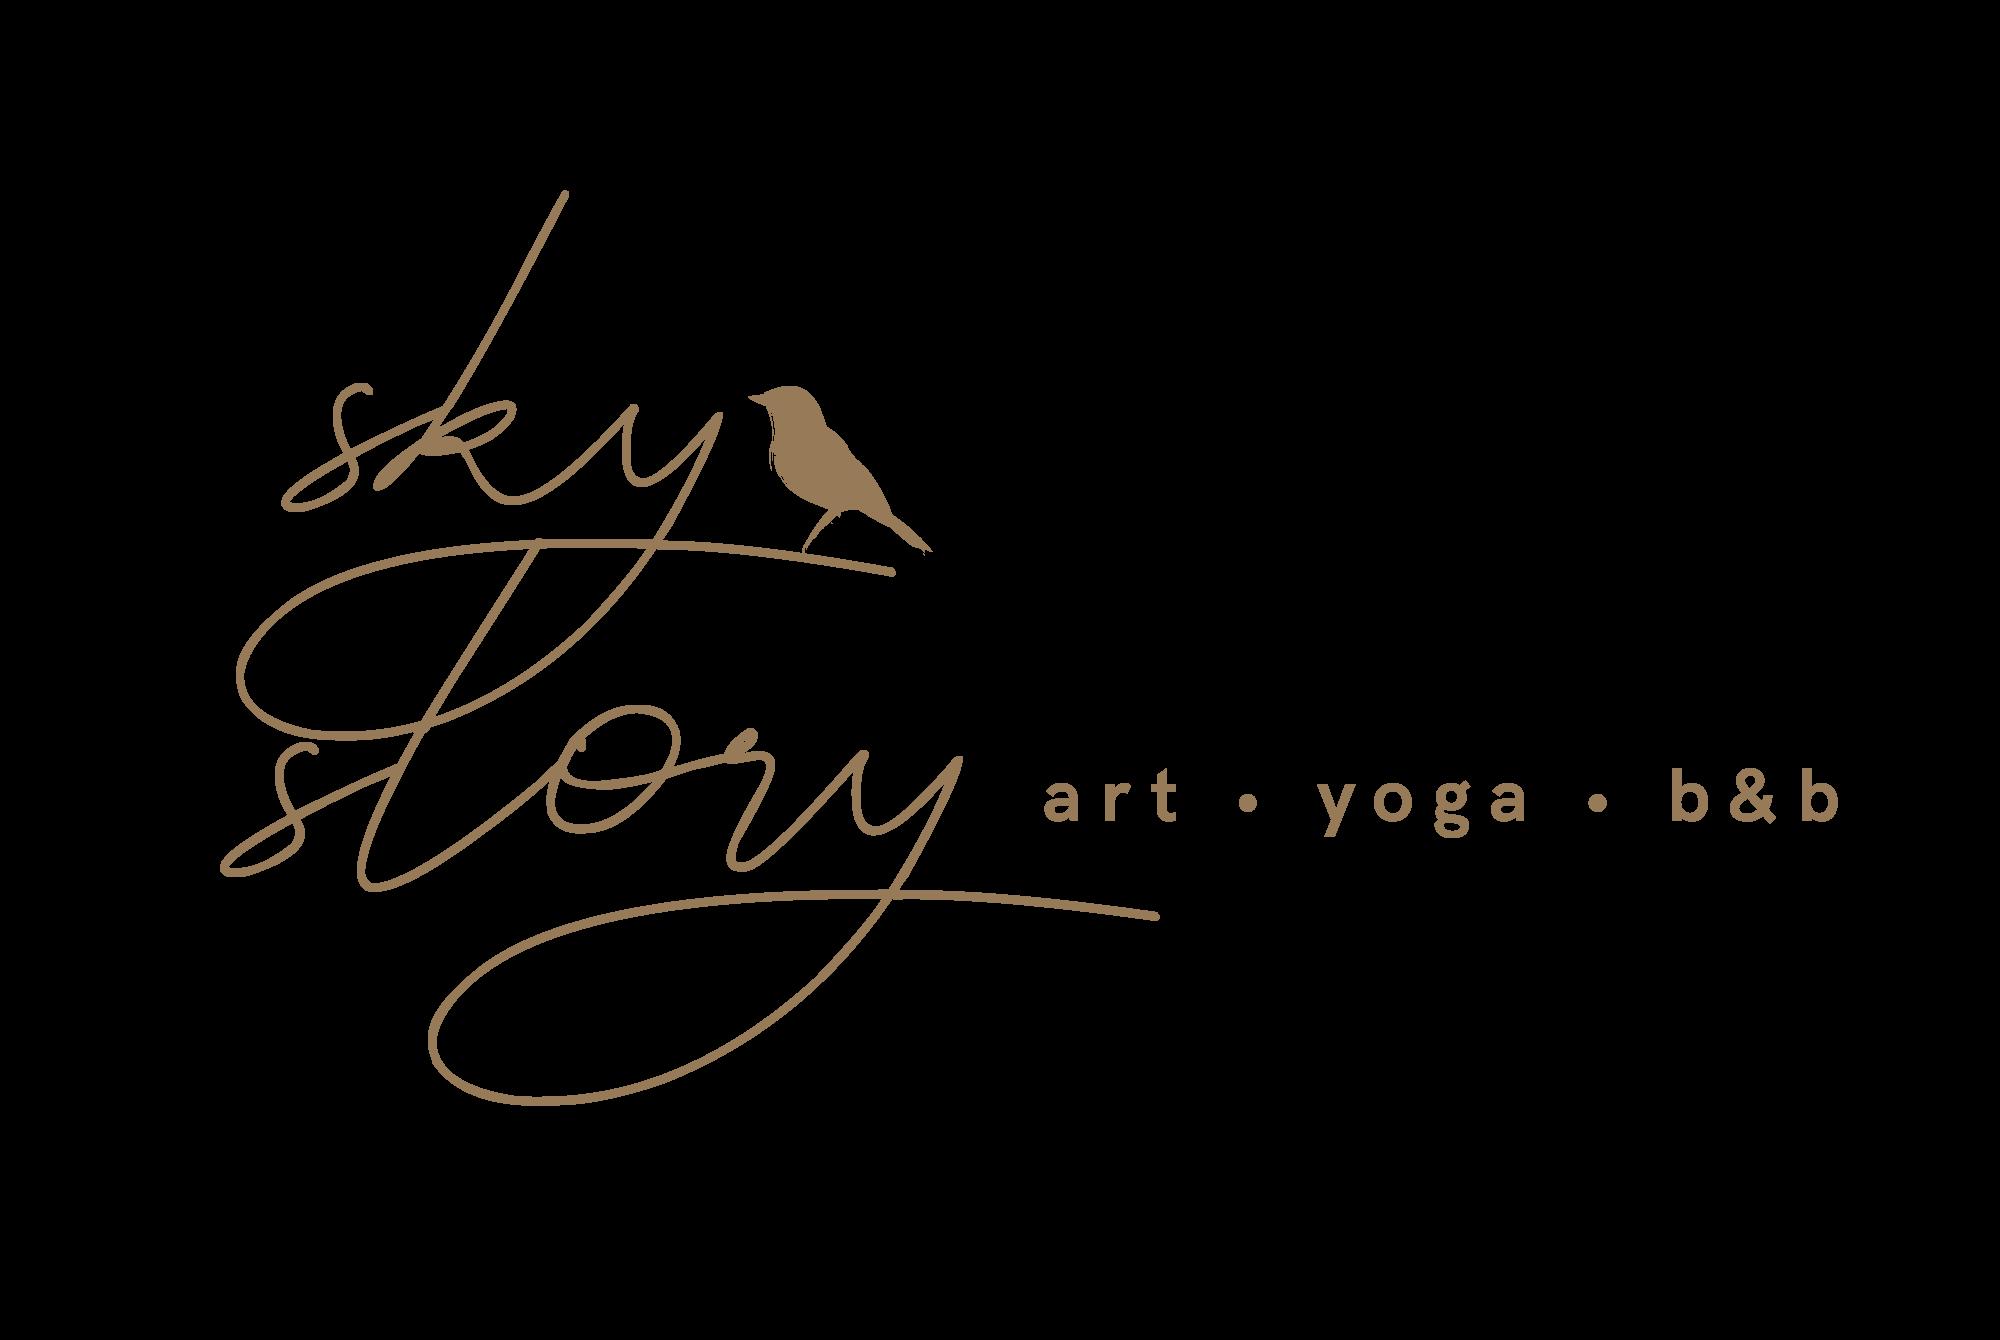 Sky Story Art + Yoga + B&B